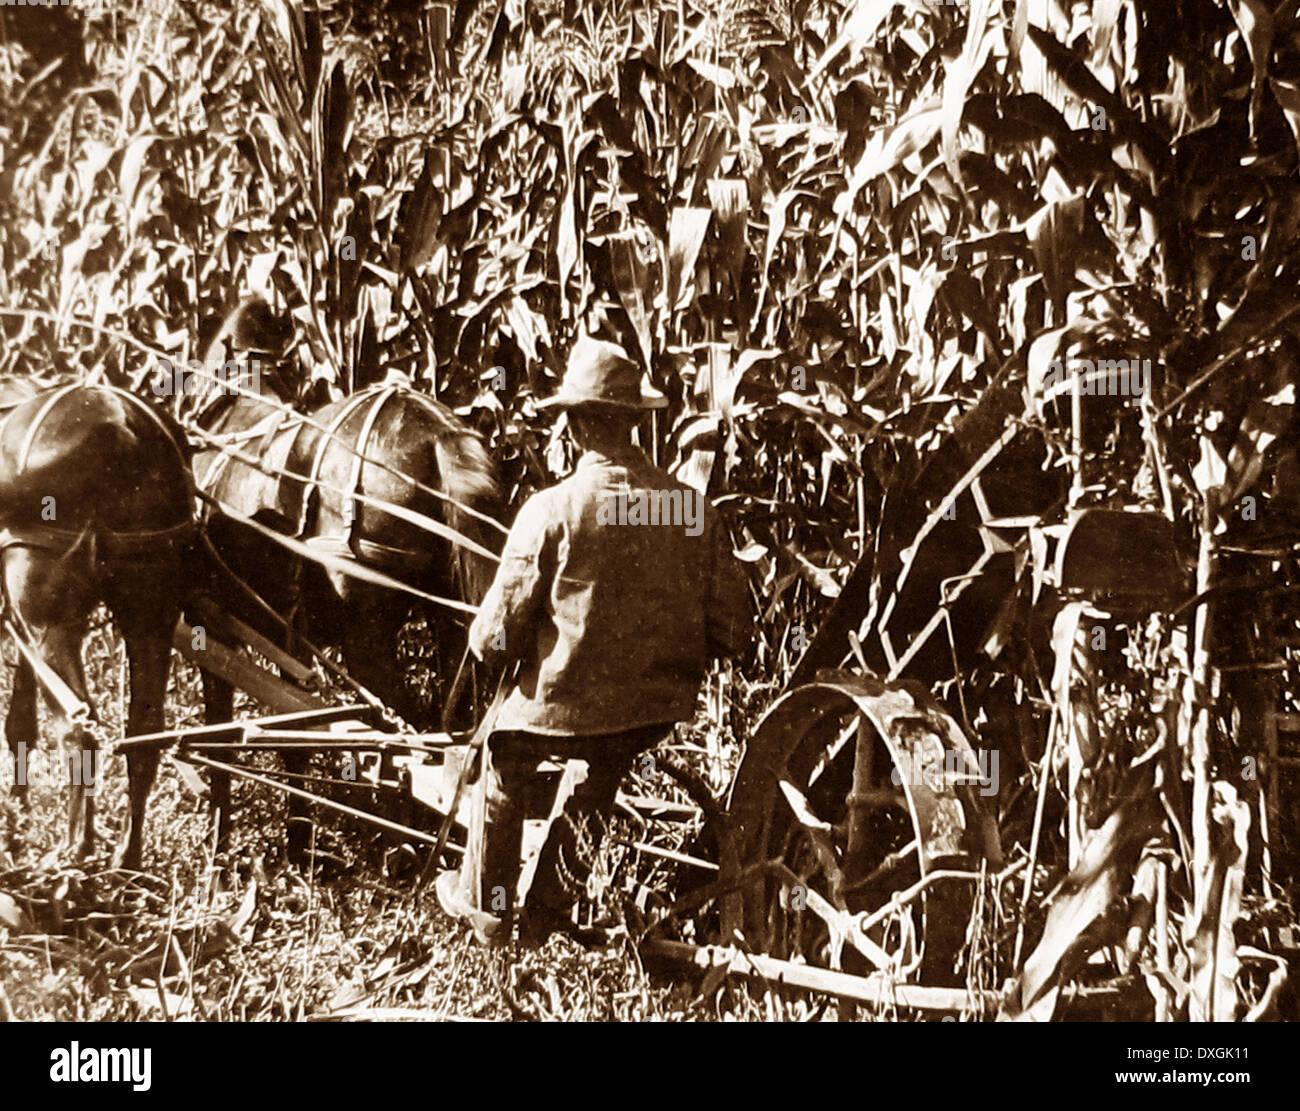 Corn binder Crawford County Pennsylvania USA early 1900s - Stock Image